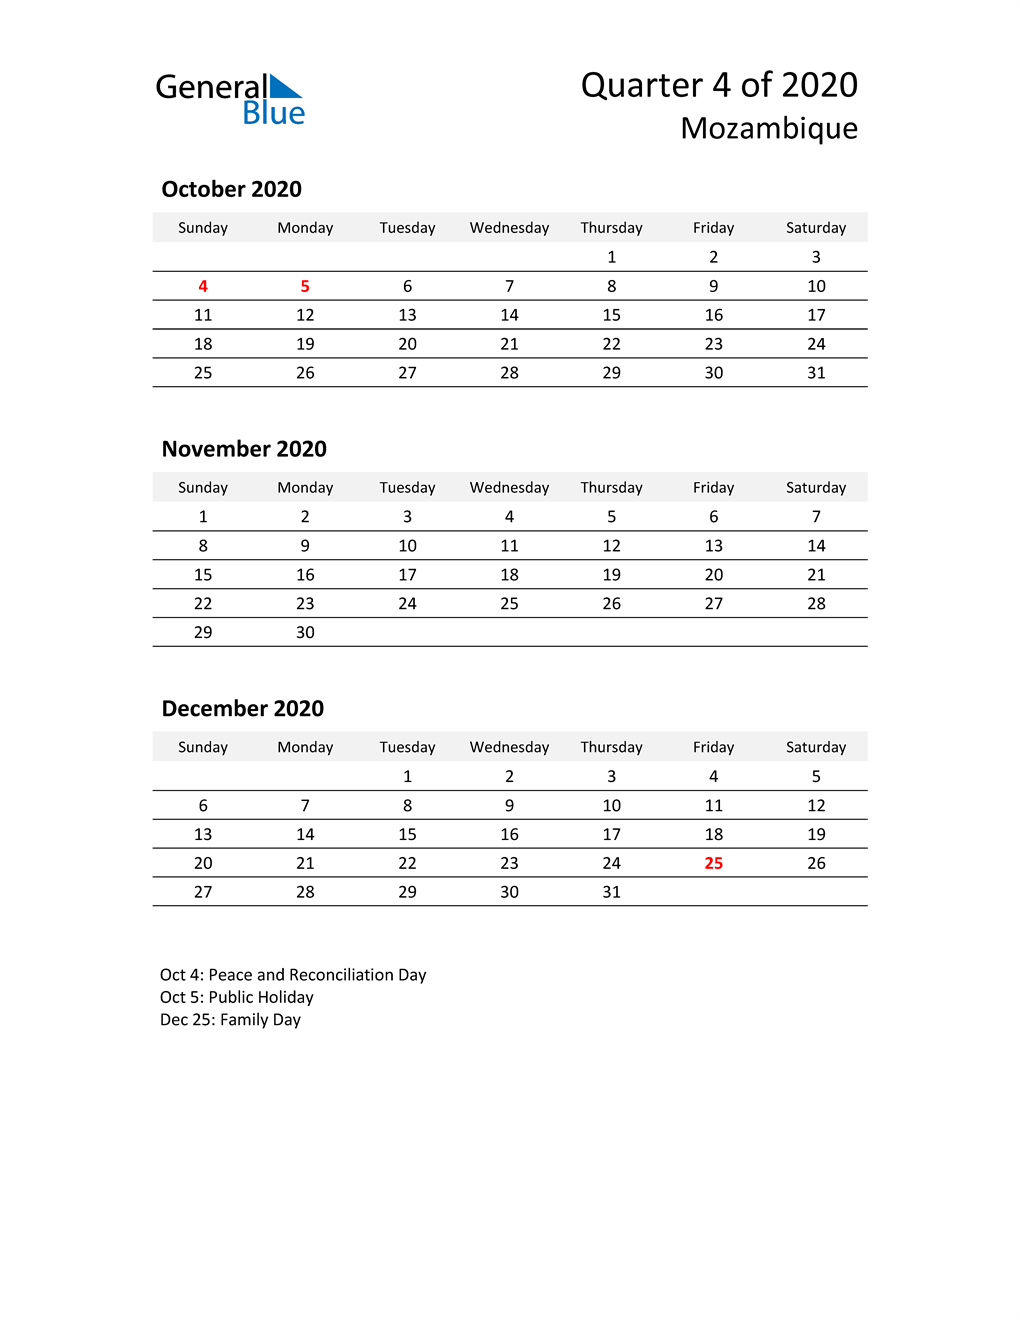 2020 Three-Month Calendar for Mozambique